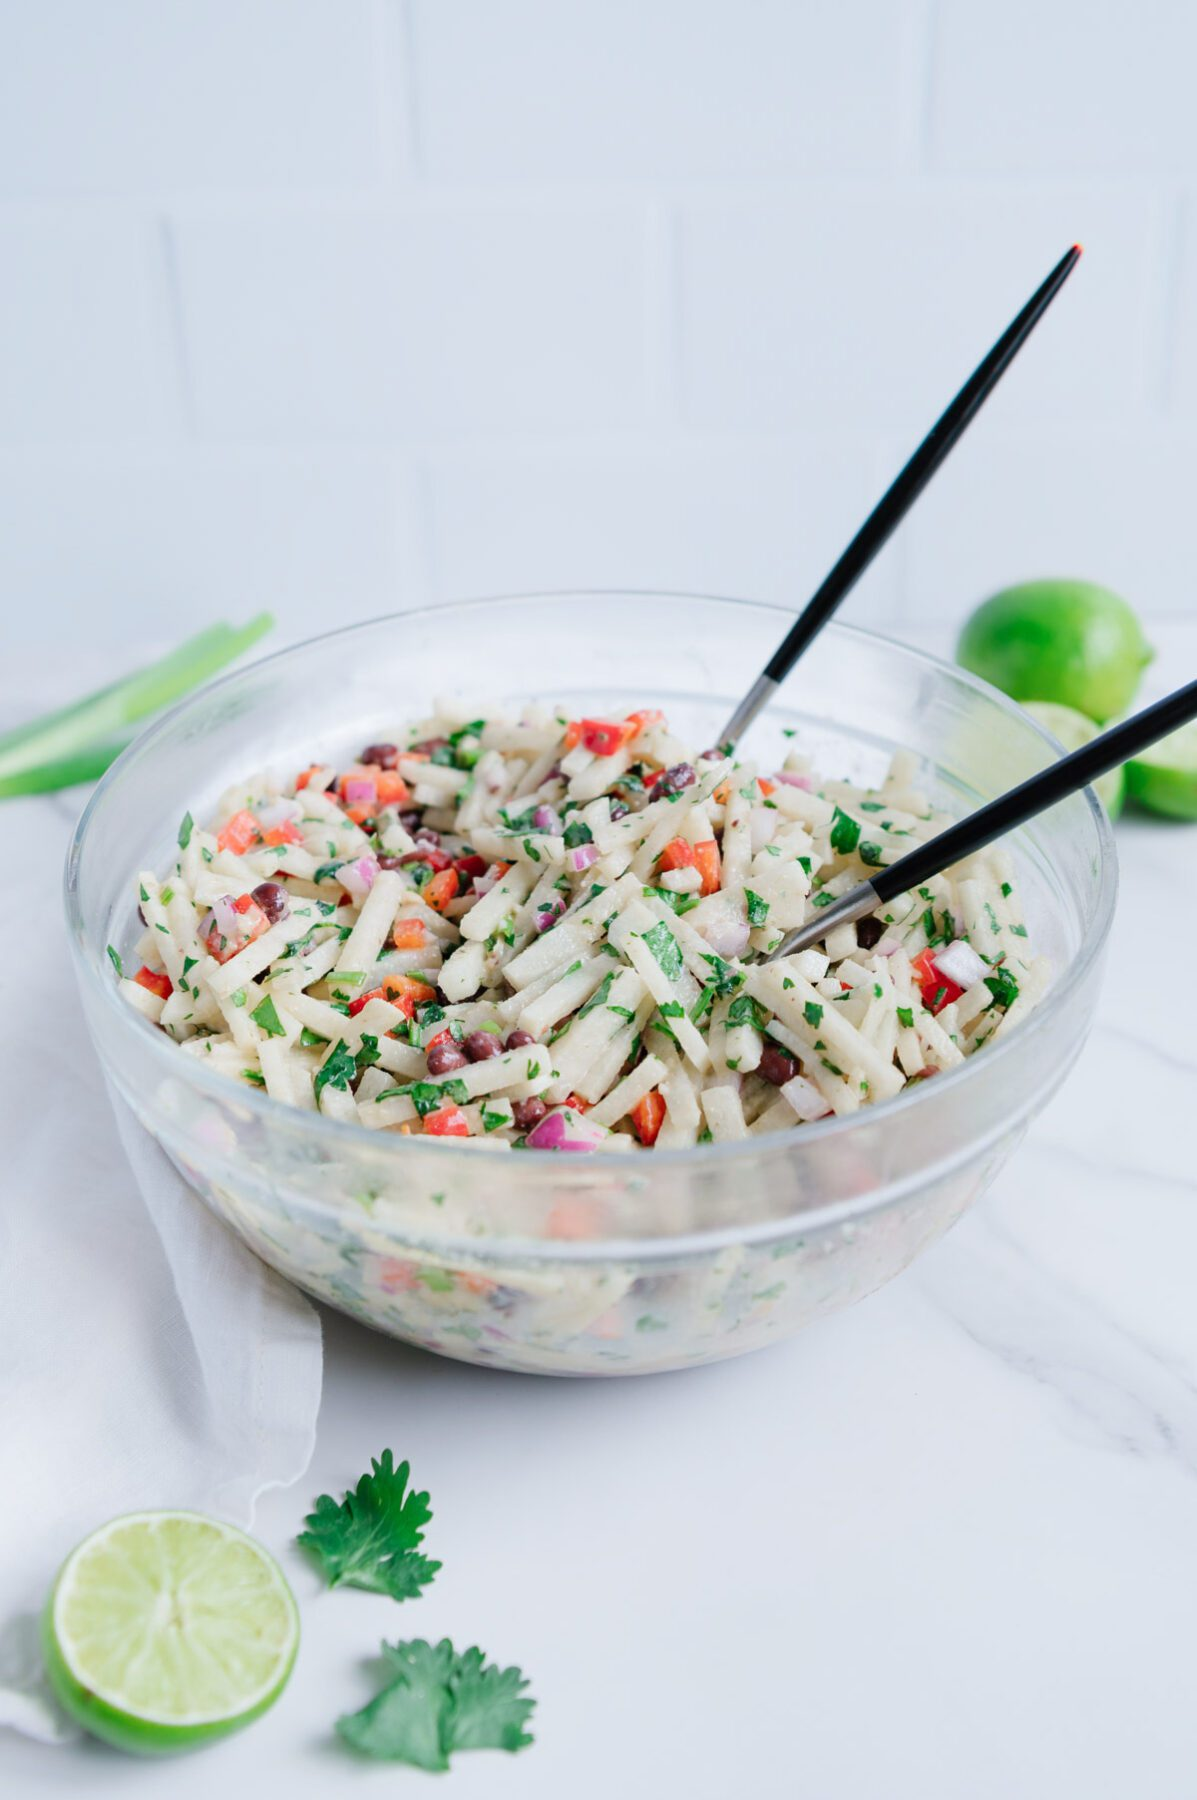 Vegan Jicama Slaw